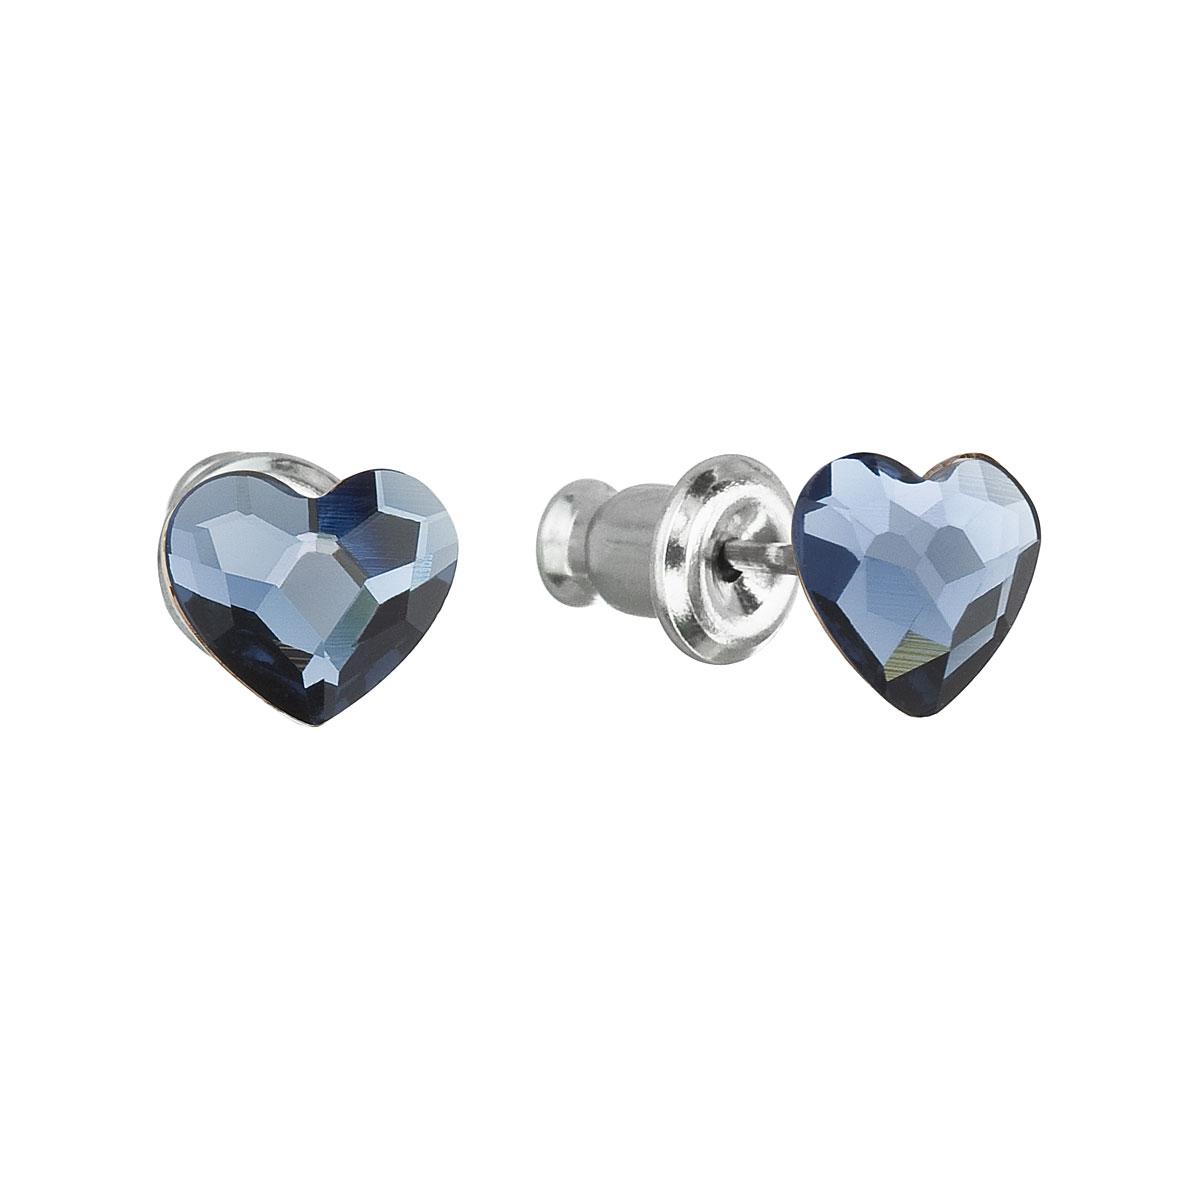 Náušnice bižutéria so Swarovski krištáľmi modré srdce 51050.3